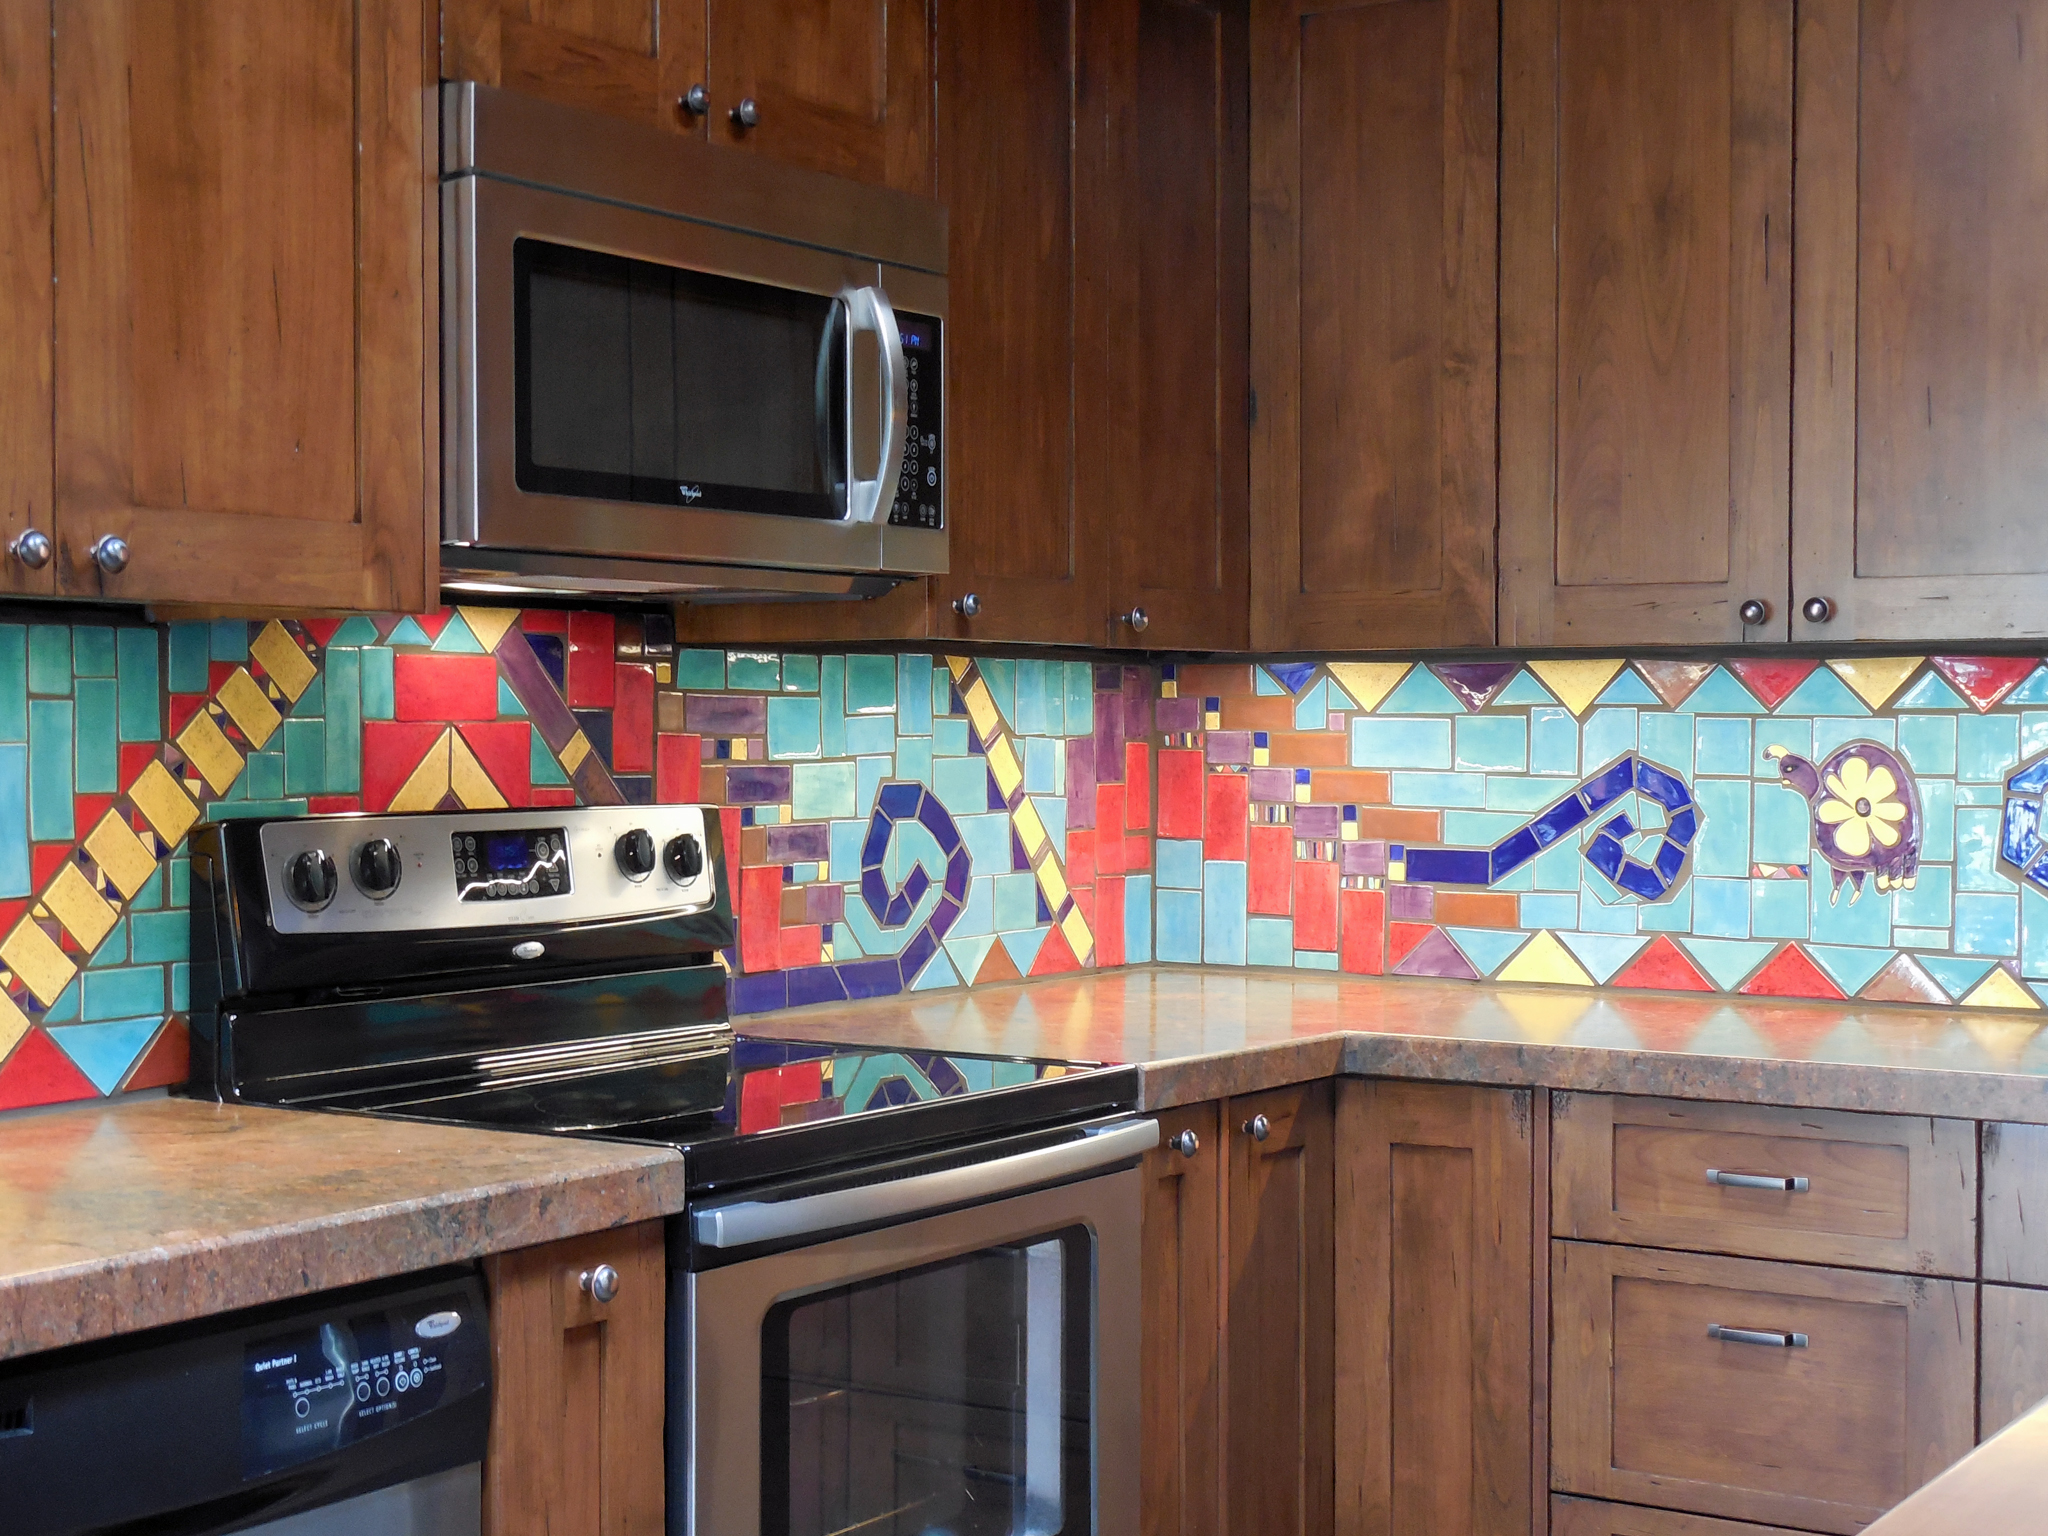 Beautiful 1 Inch Ceramic Tiles Huge 12 X 12 Ceramic Tile Square 2 X 2 Ceiling Tiles 24 X 48 Ceiling Tiles Young 2X2 Ceiling Tile Green2X4 Glass Tile Backsplash Ceramic Tile Backsplashes: Pictures, Ideas \u0026 Tips From HGTV   HGTV